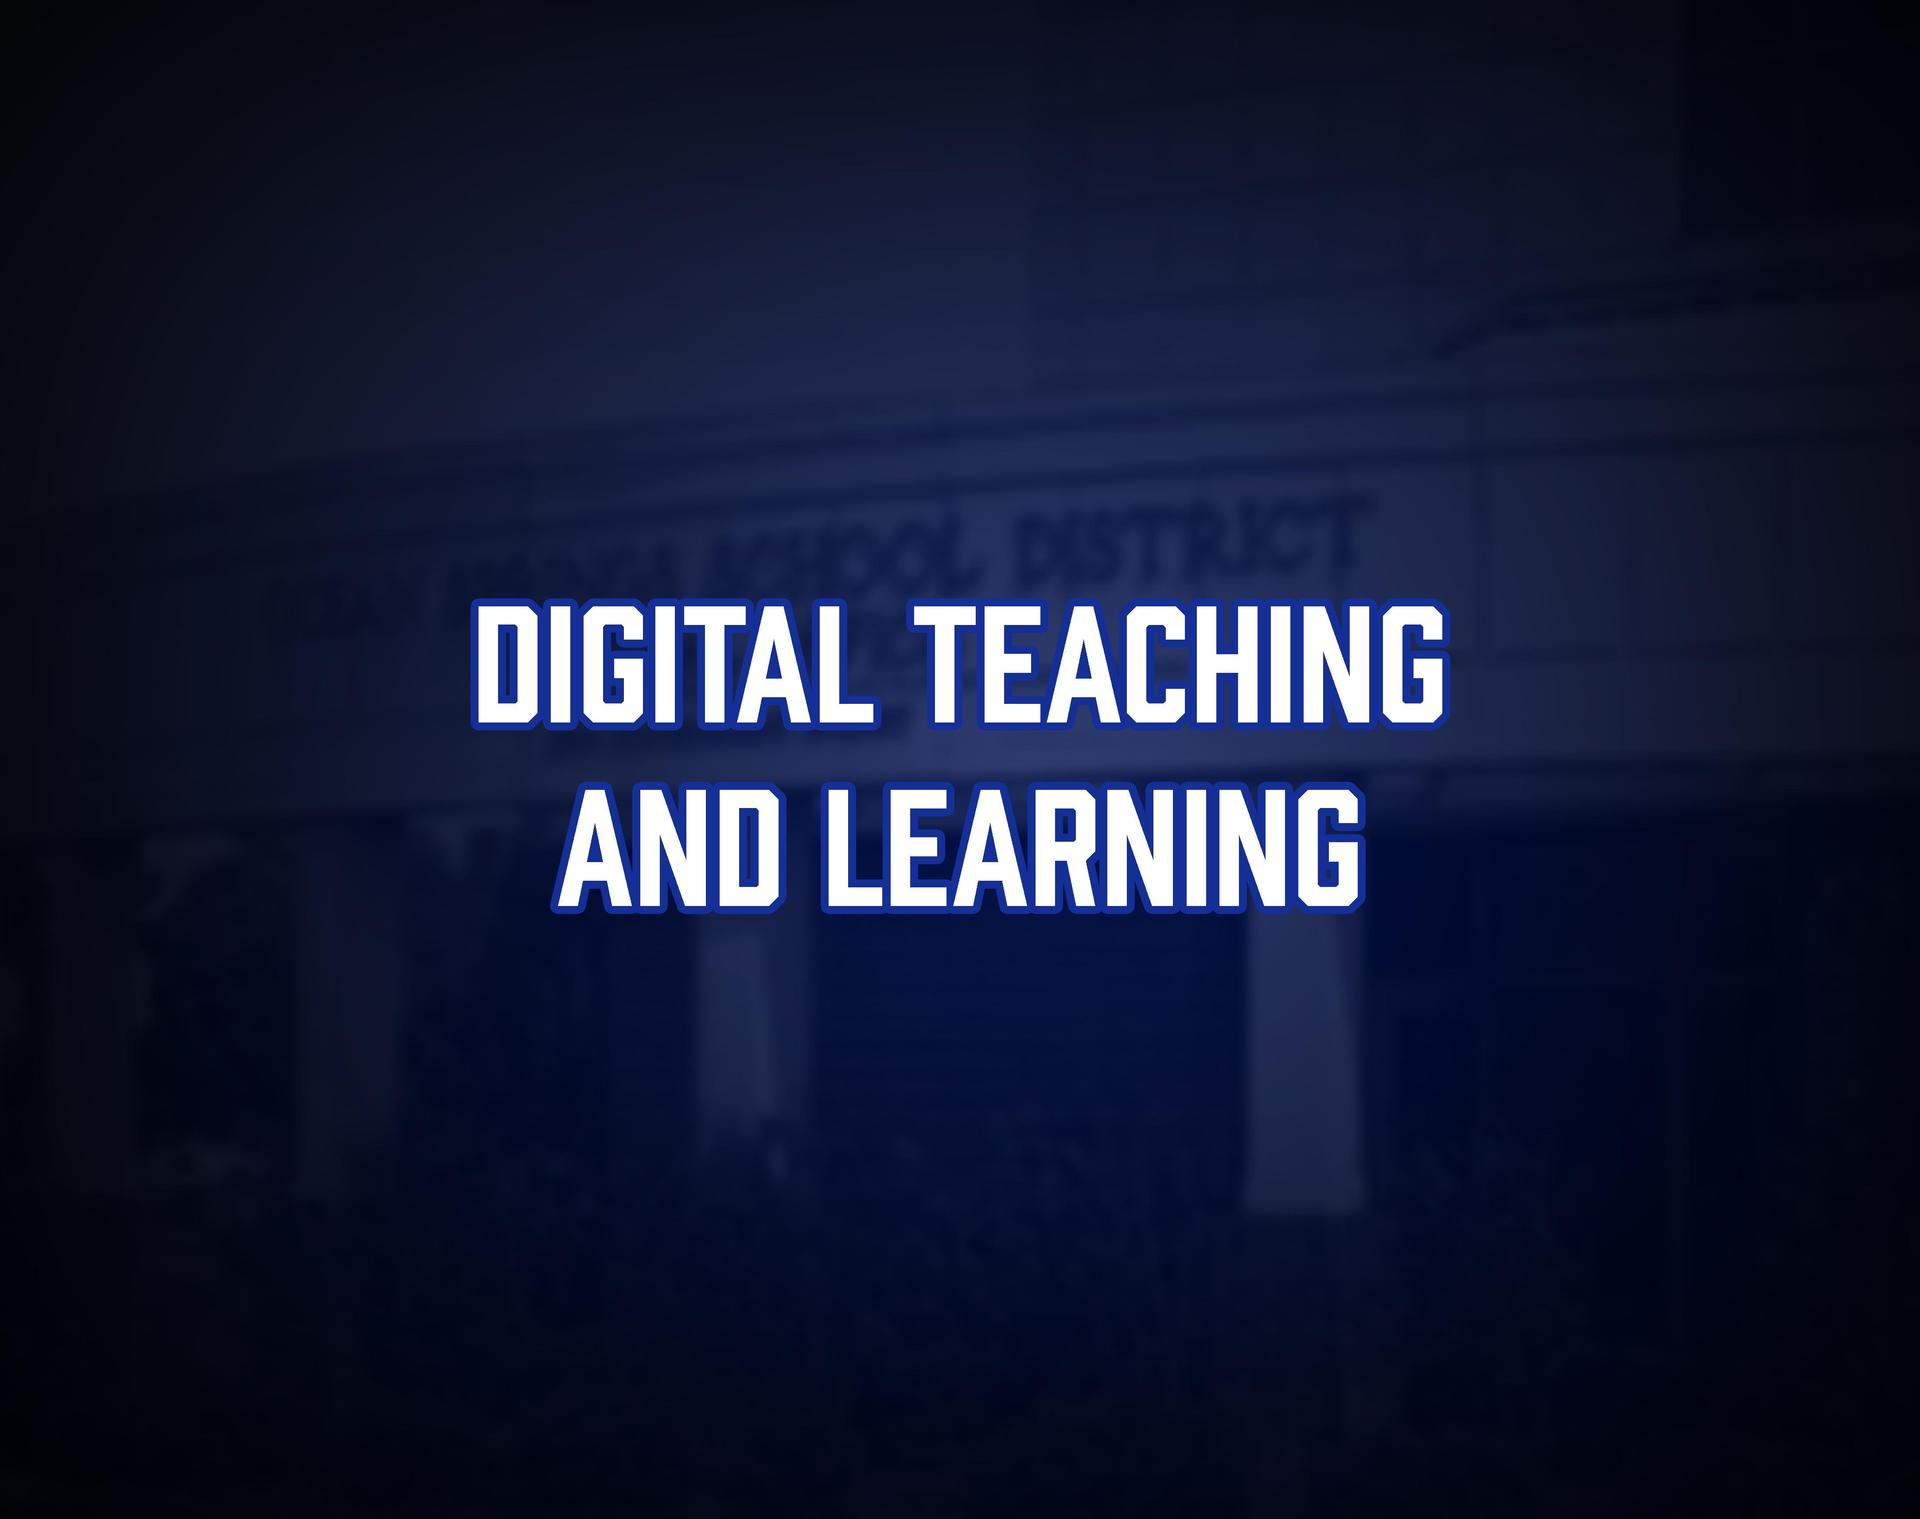 Digital Teaching